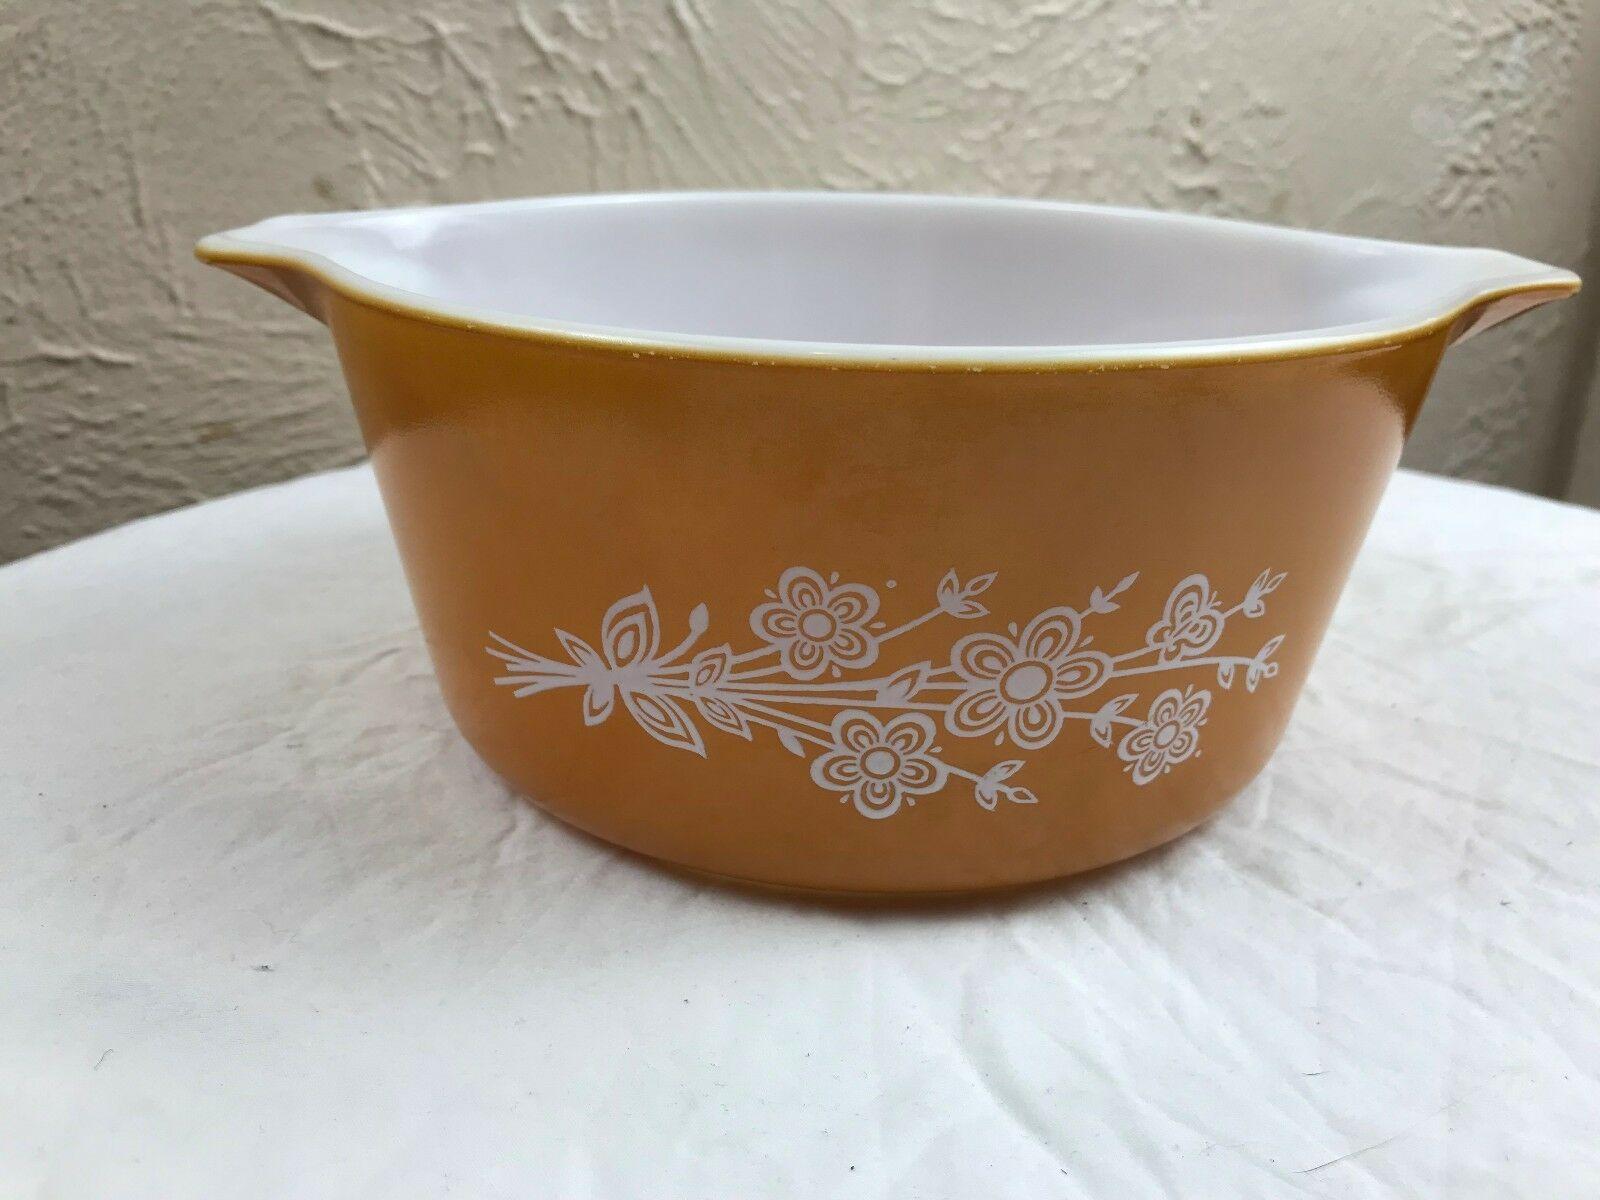 Vintage Pyrex Butterfly Gold Casserole Dish #474-B 1.5 Qt